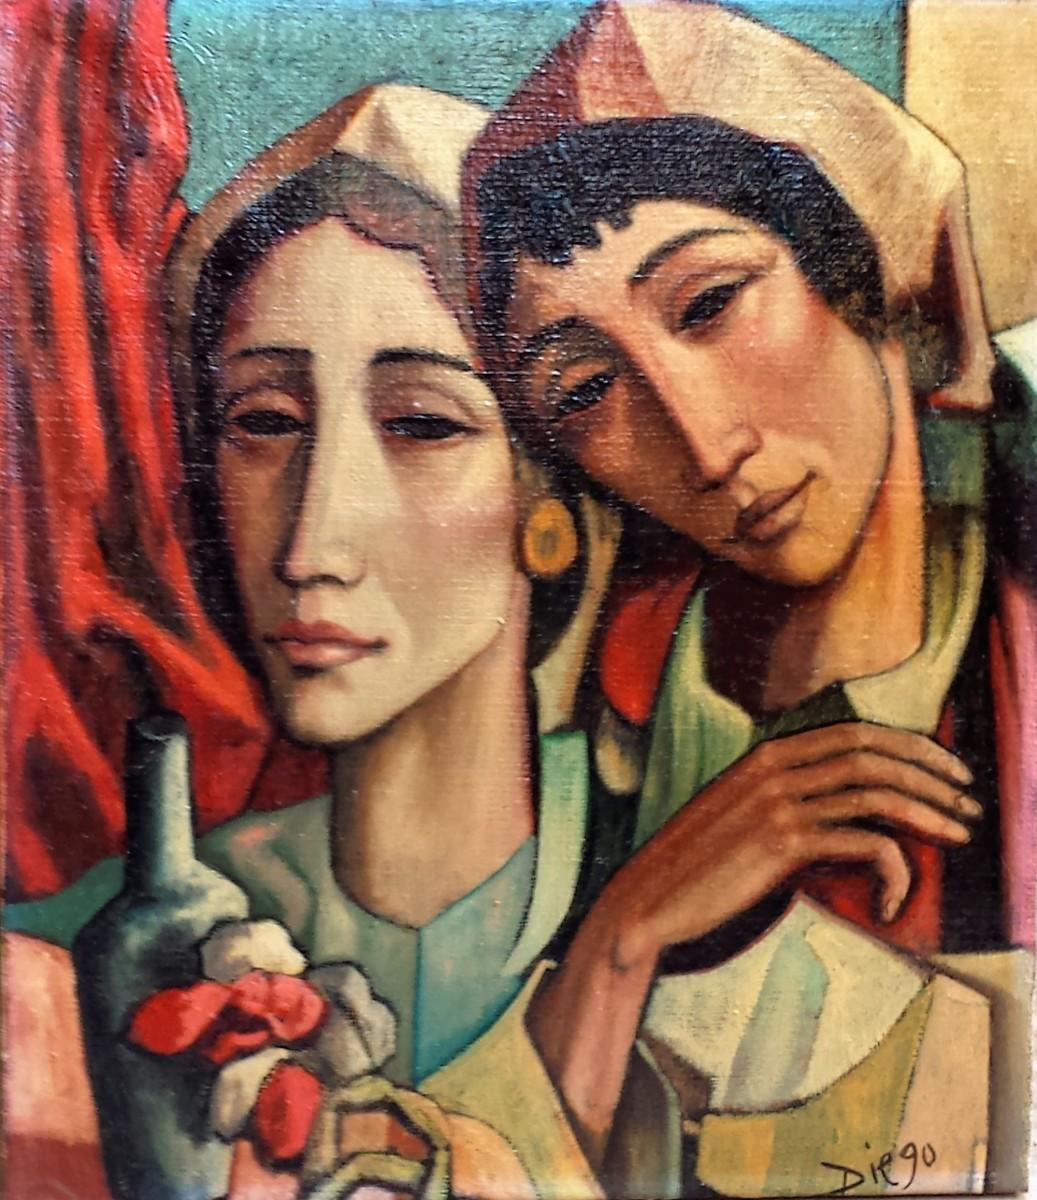 """Spanish Girls"" by Antonio Diego Voci #C98 by Antonio Diego Voci"